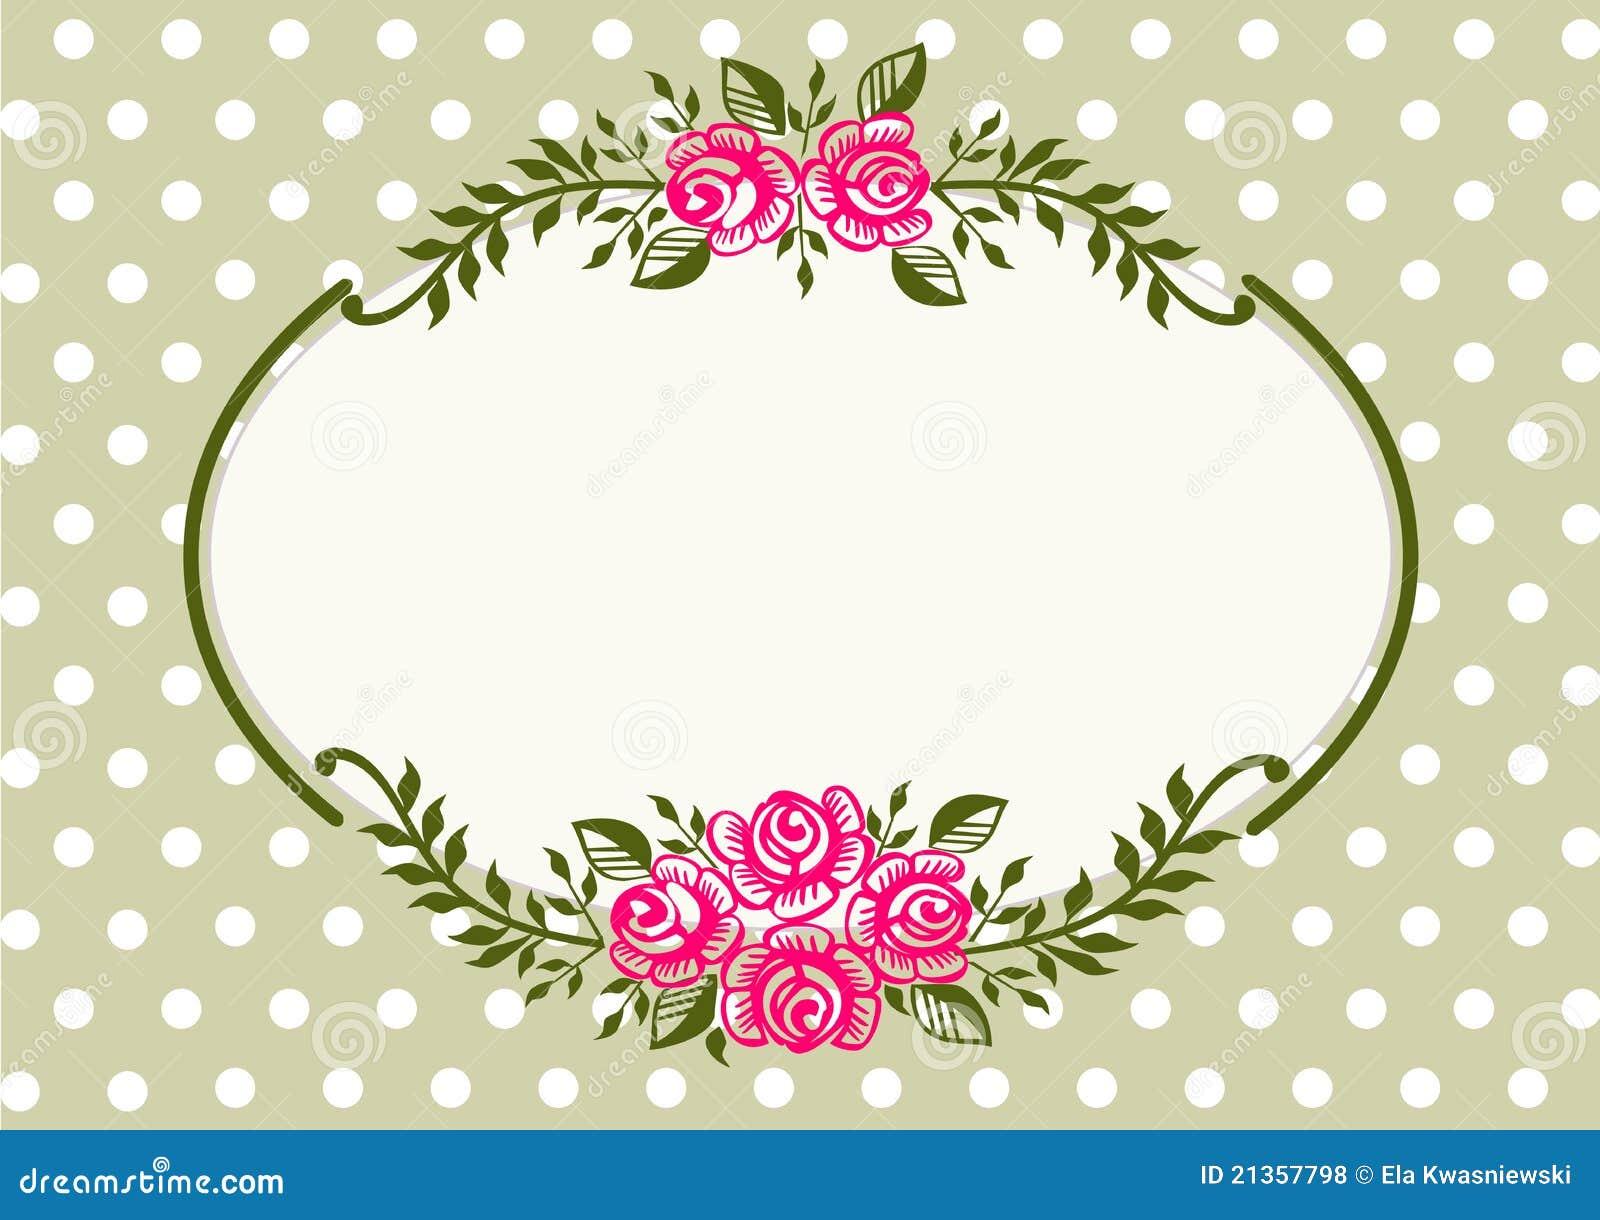 Marco verde de las rosas de la vendimia